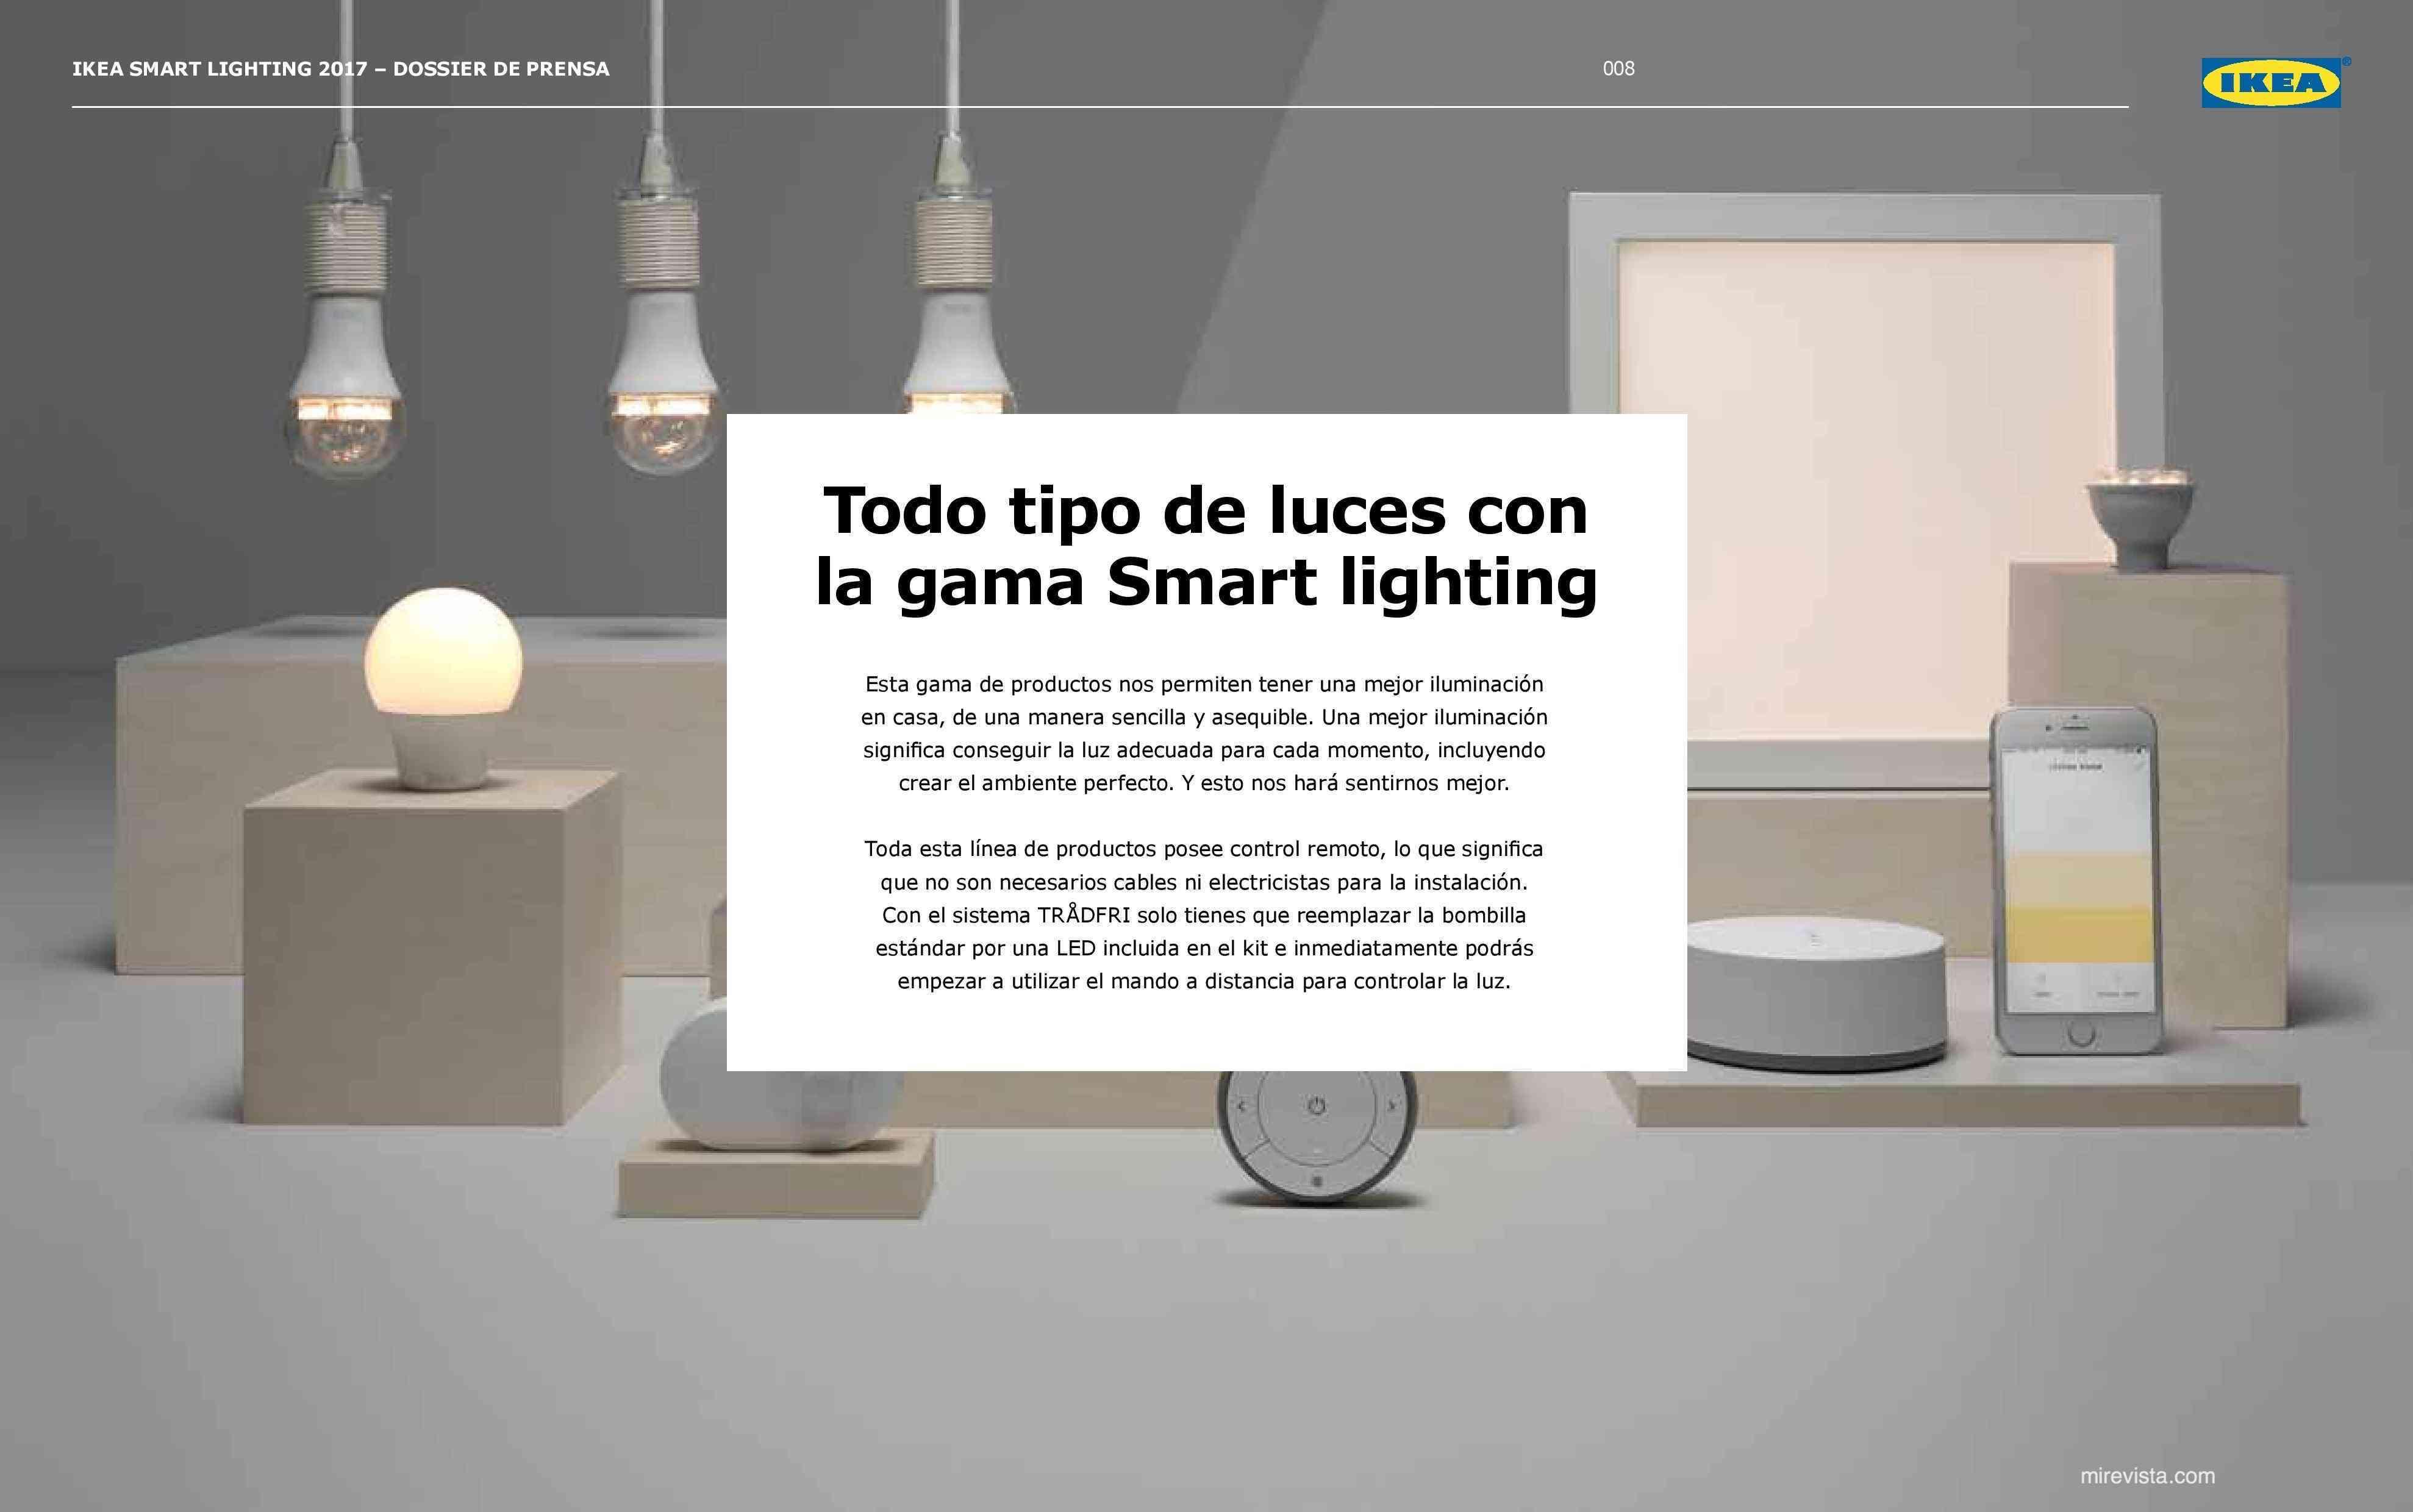 Novedades en iluminación de casas inteligentes con IKEA 64